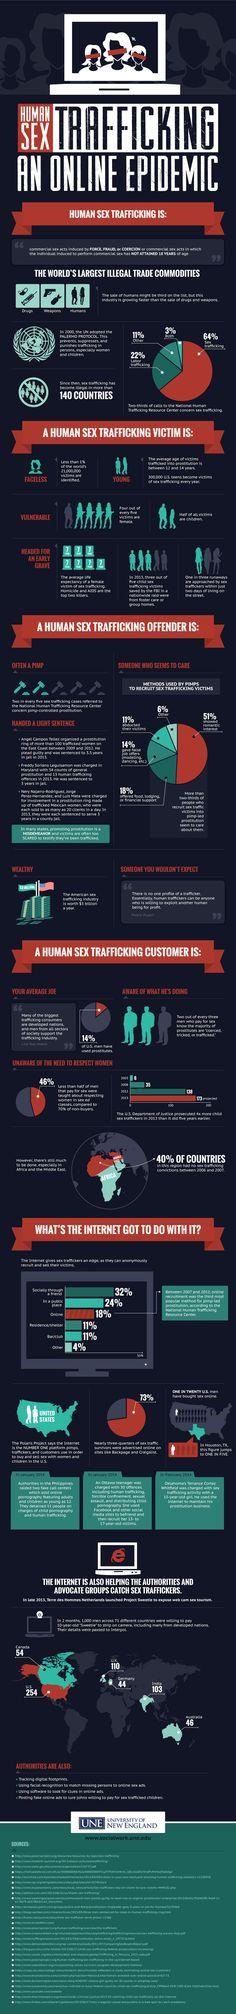 Human Sex Trafficking: An Online Epidemic #infographic